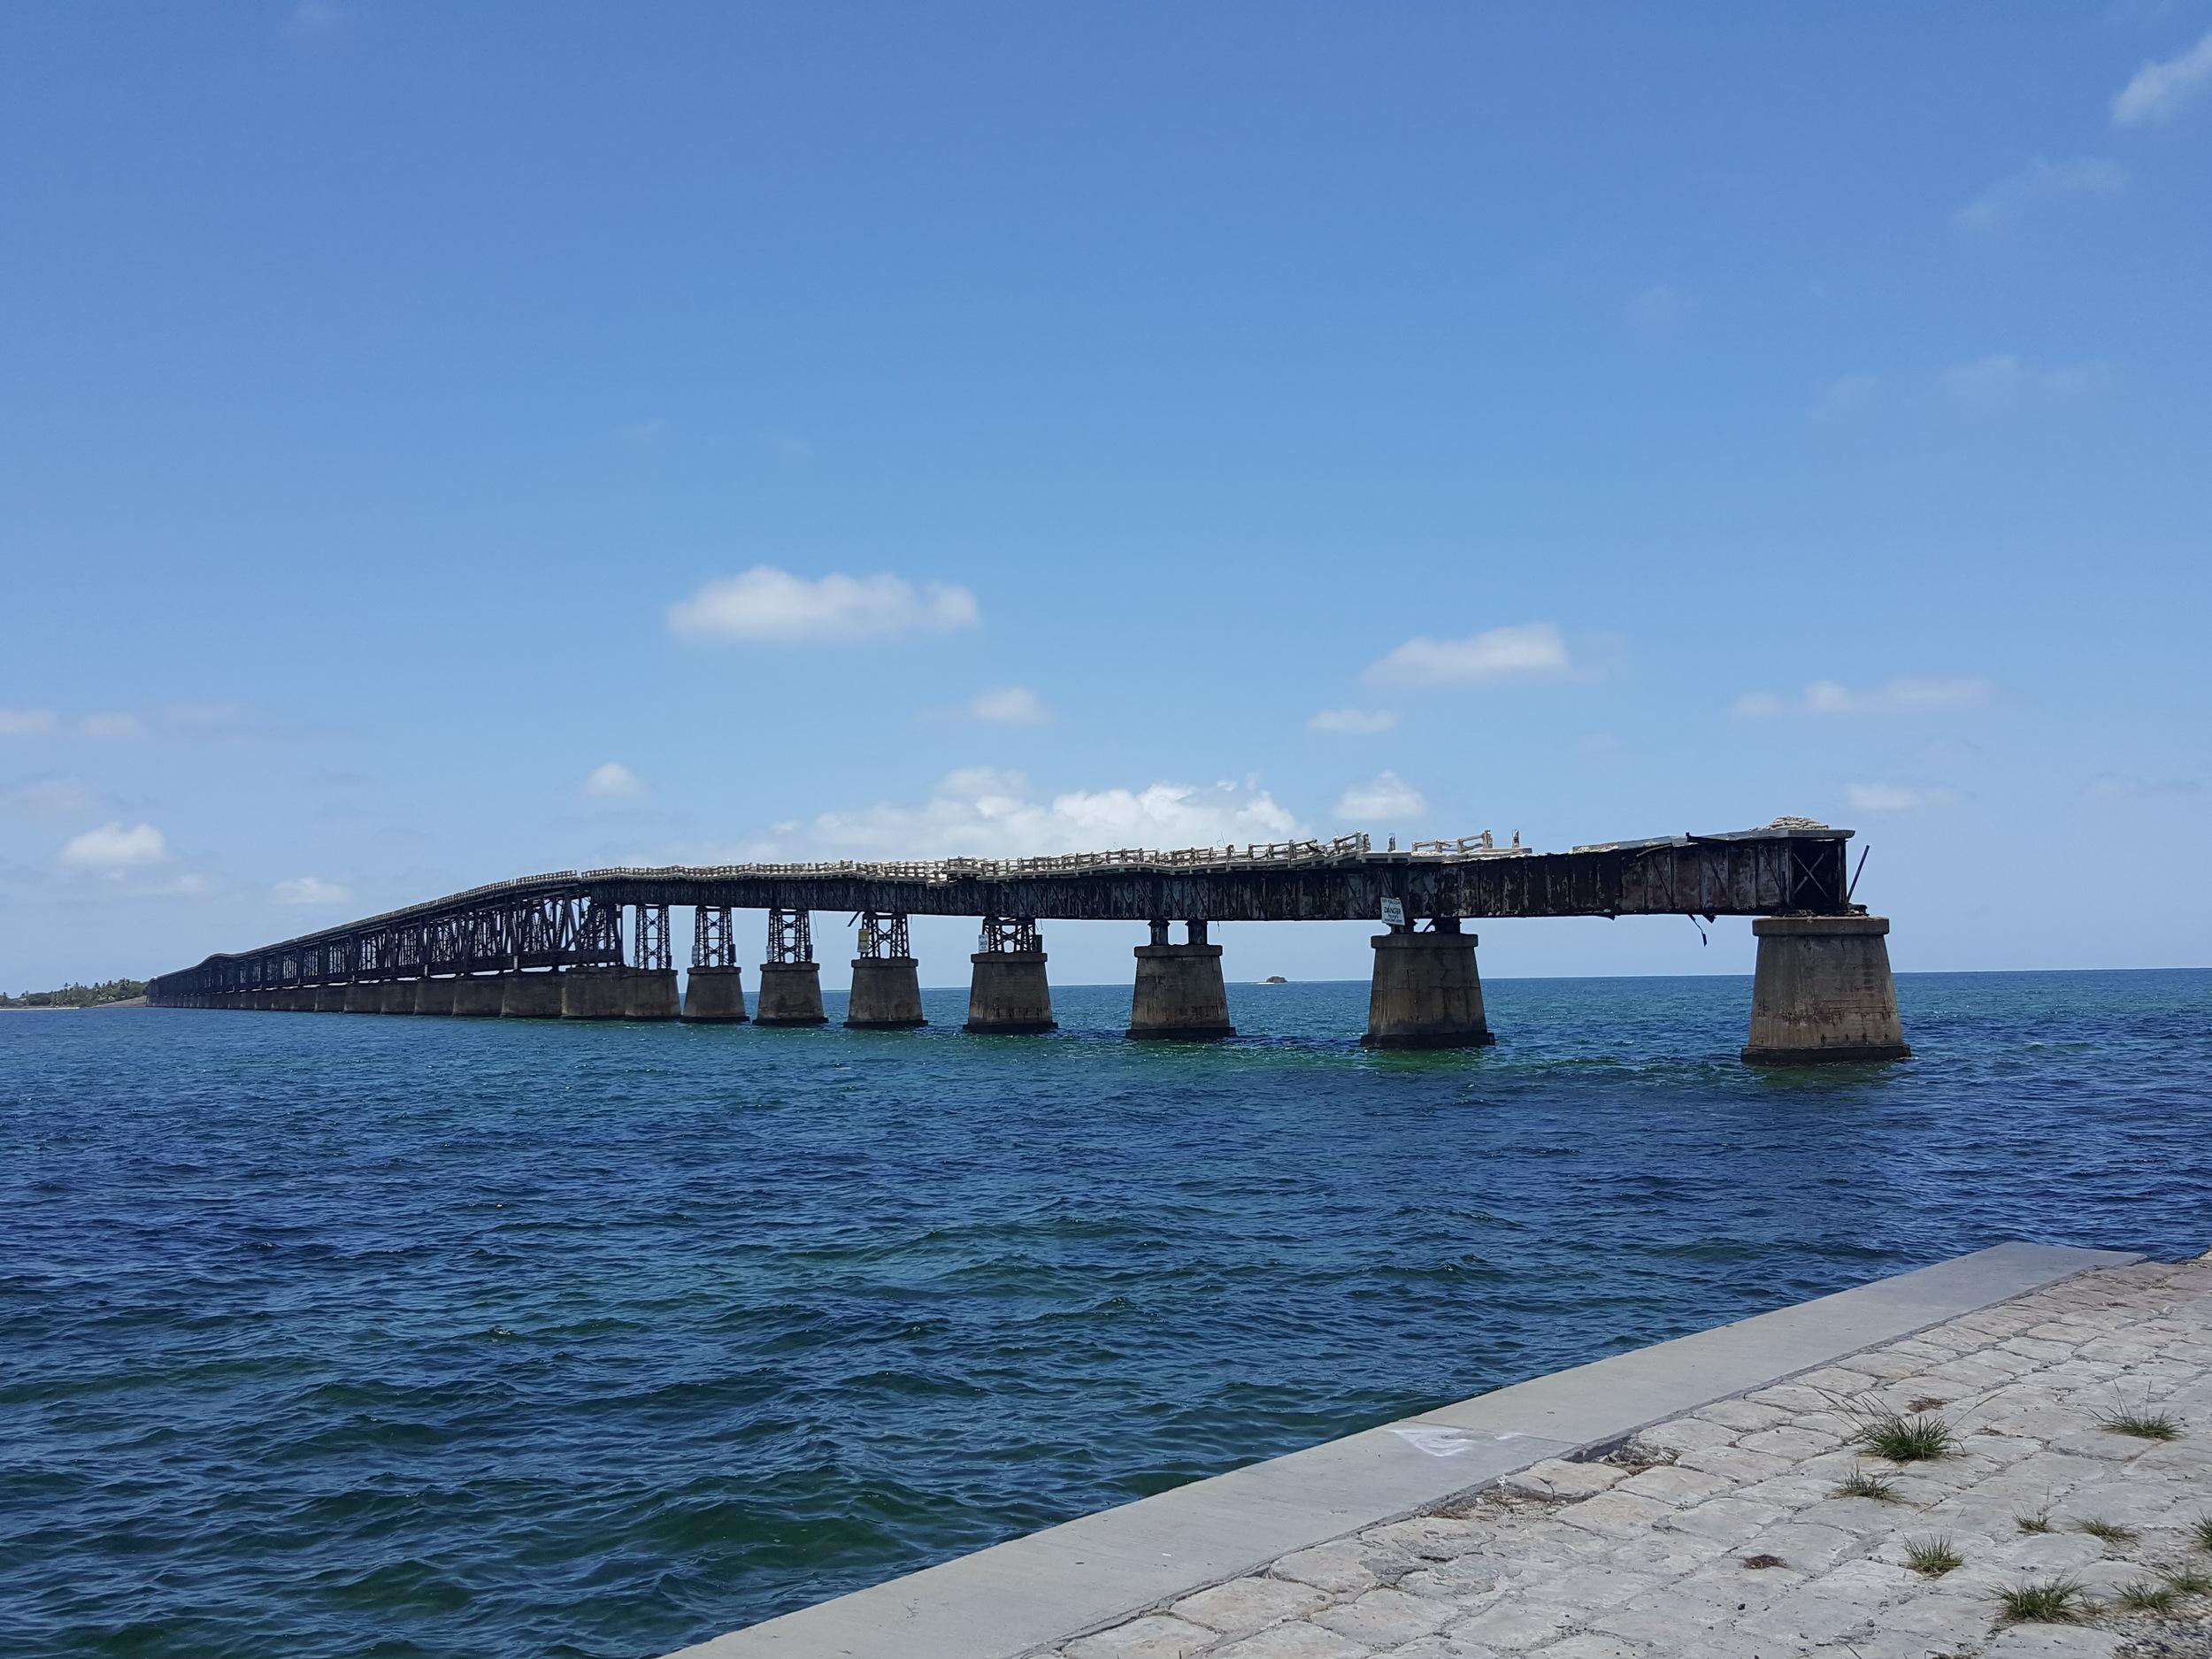 The Old Bahia Honda Railway Bridge, destroyed by a hurricane in 1935.